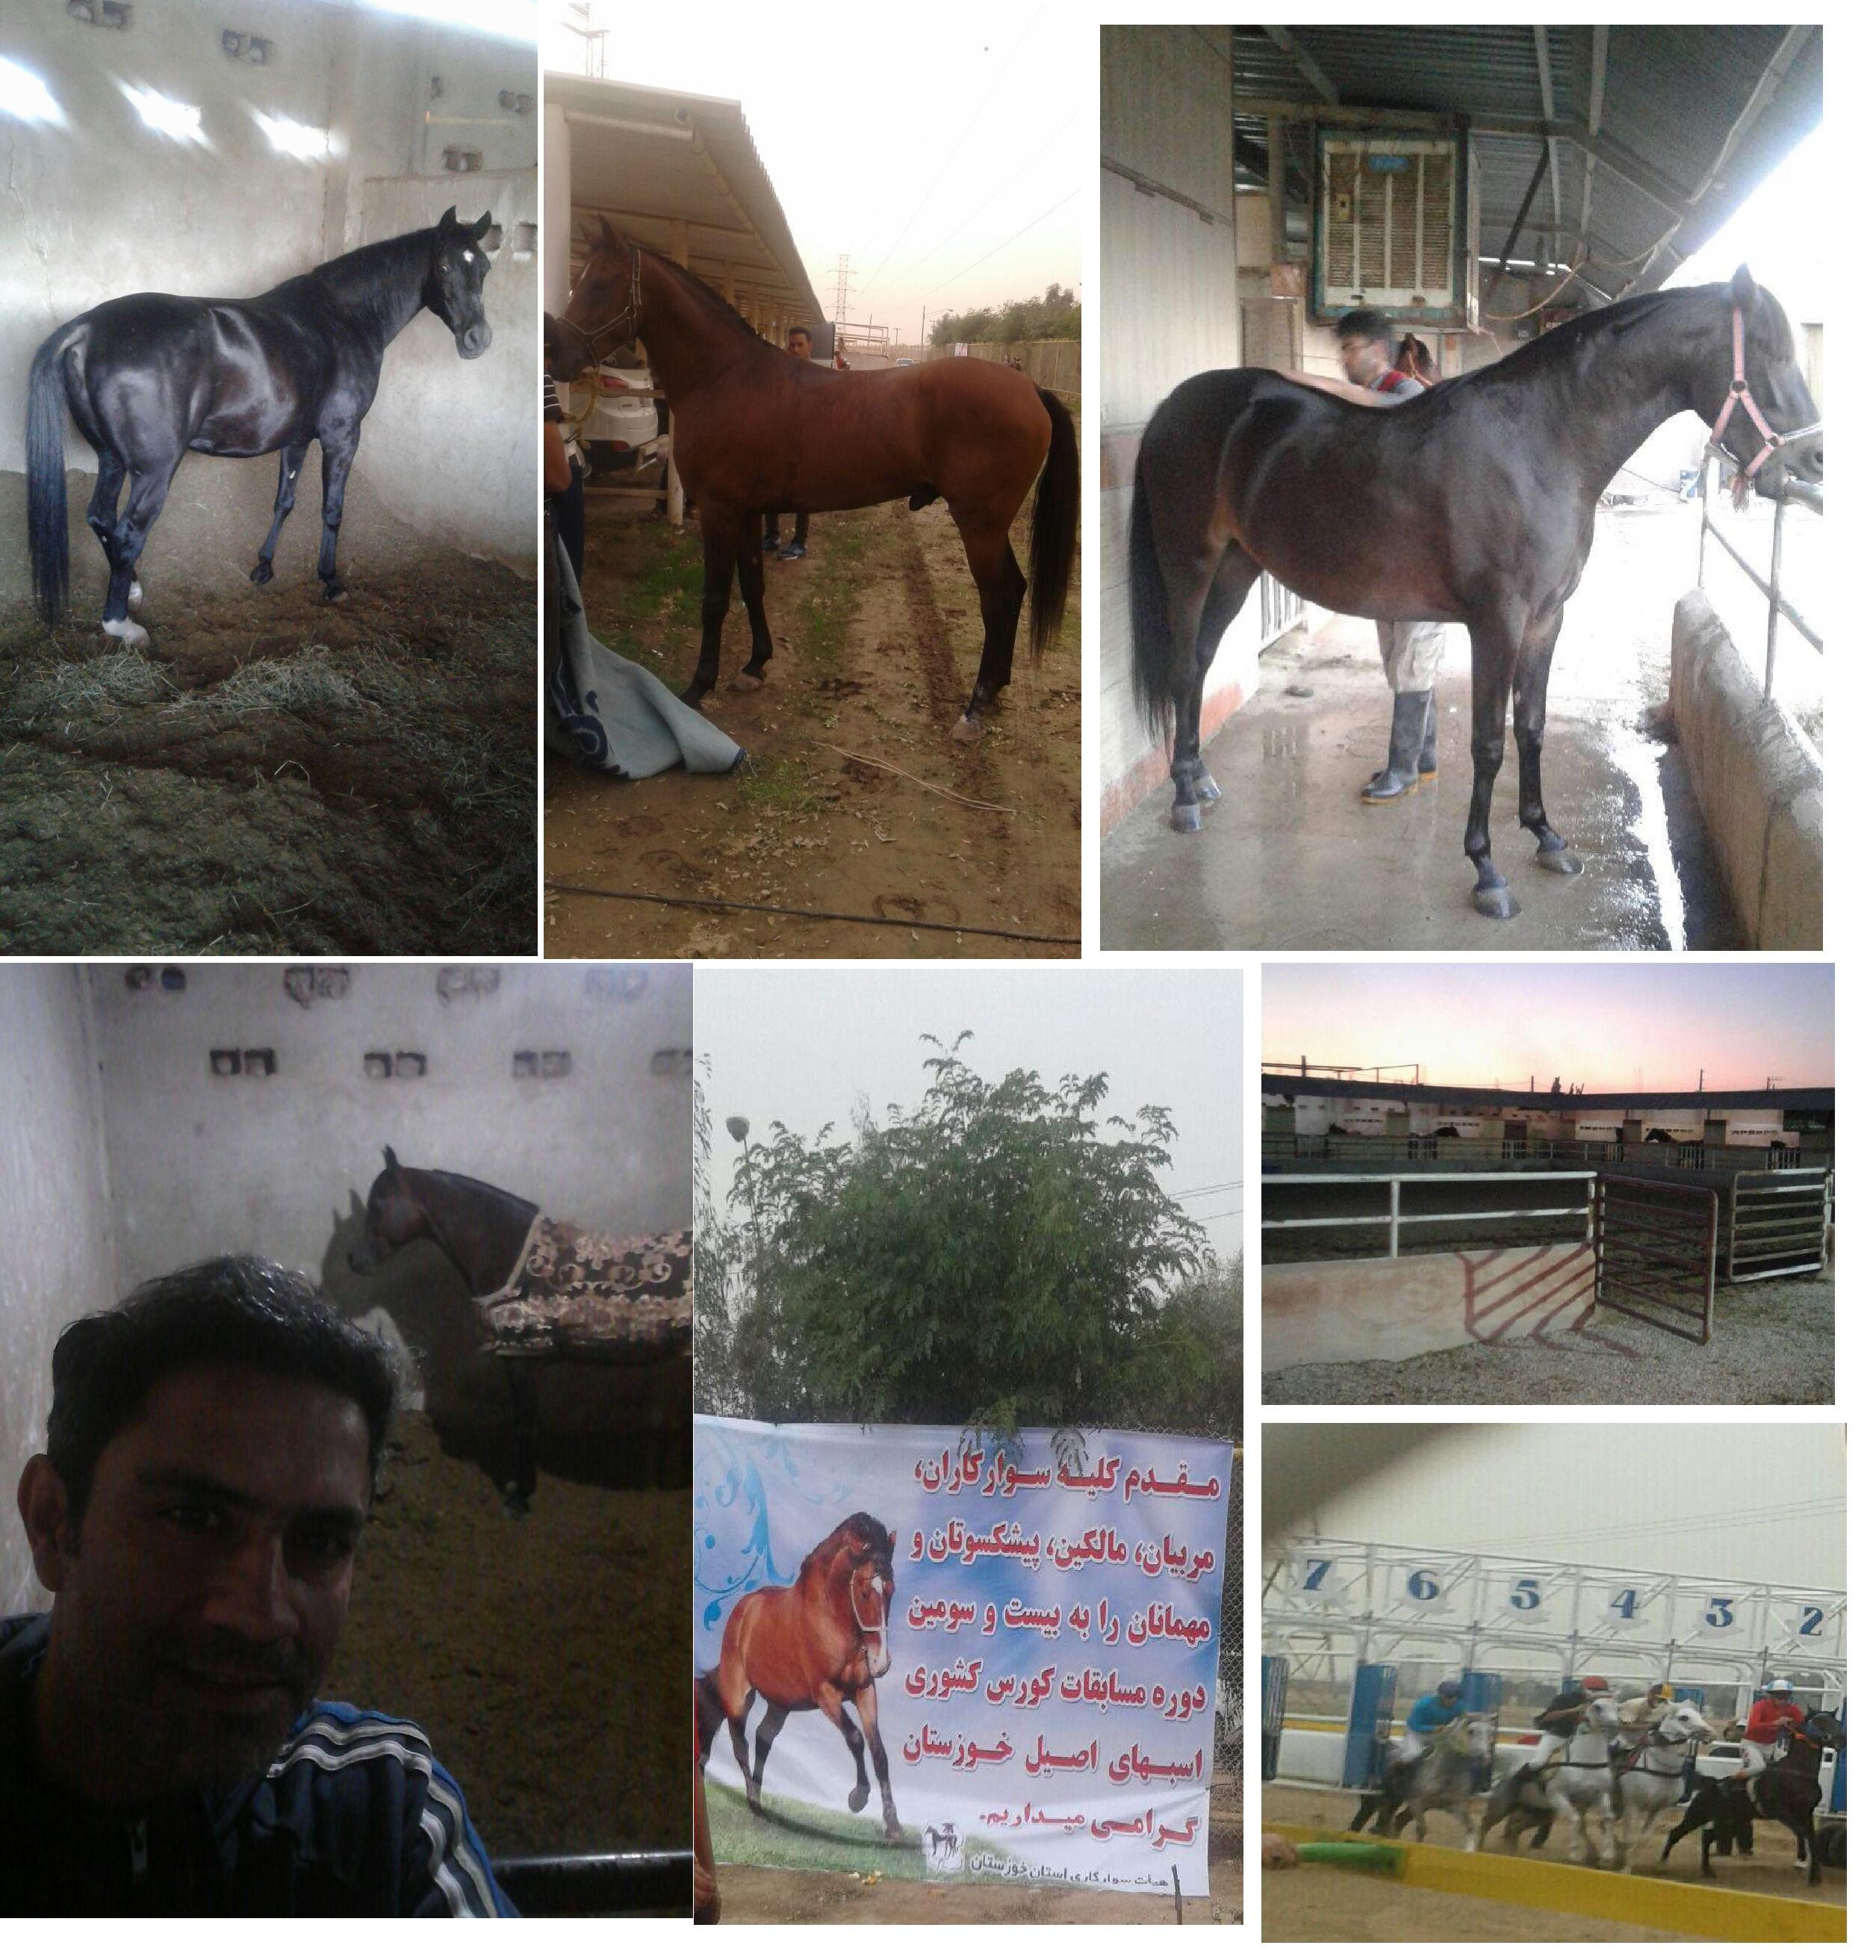 a7oa_khoozestan_kolli.jpg